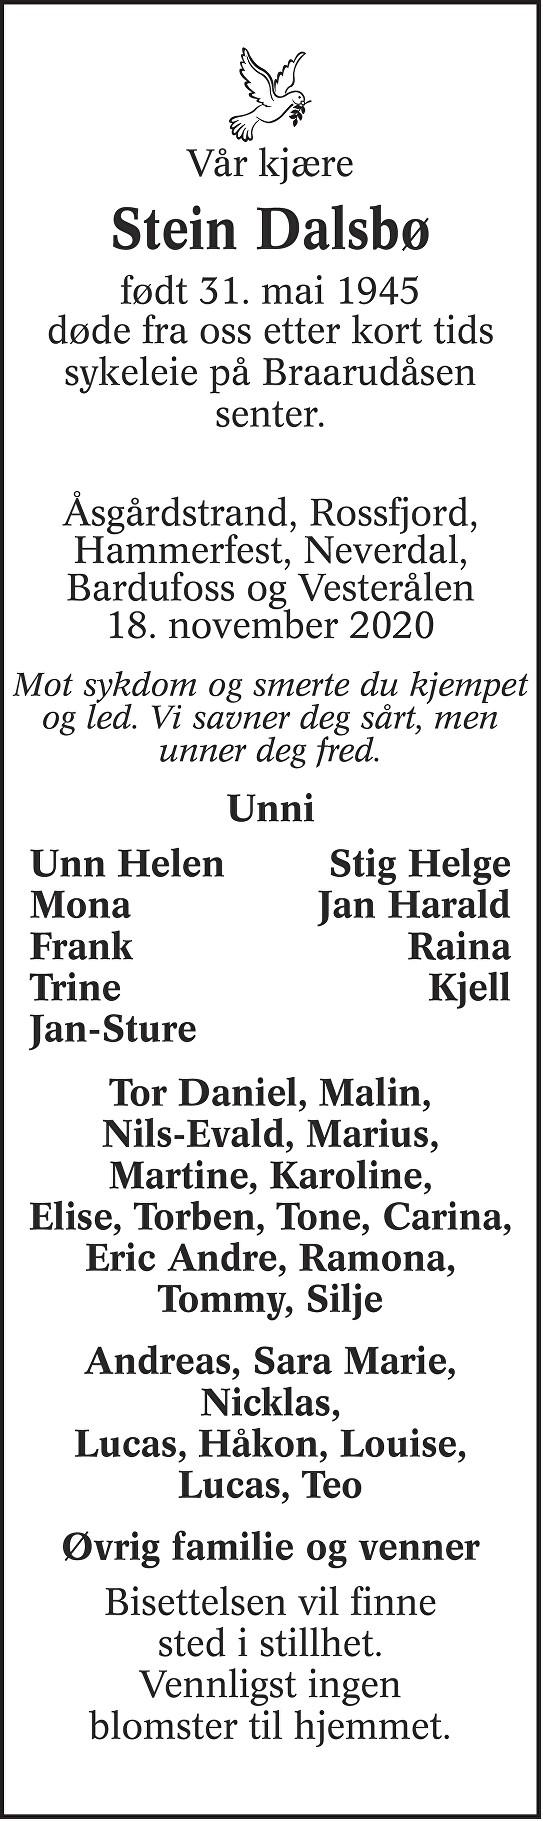 Stein Dalsbø Dødsannonse